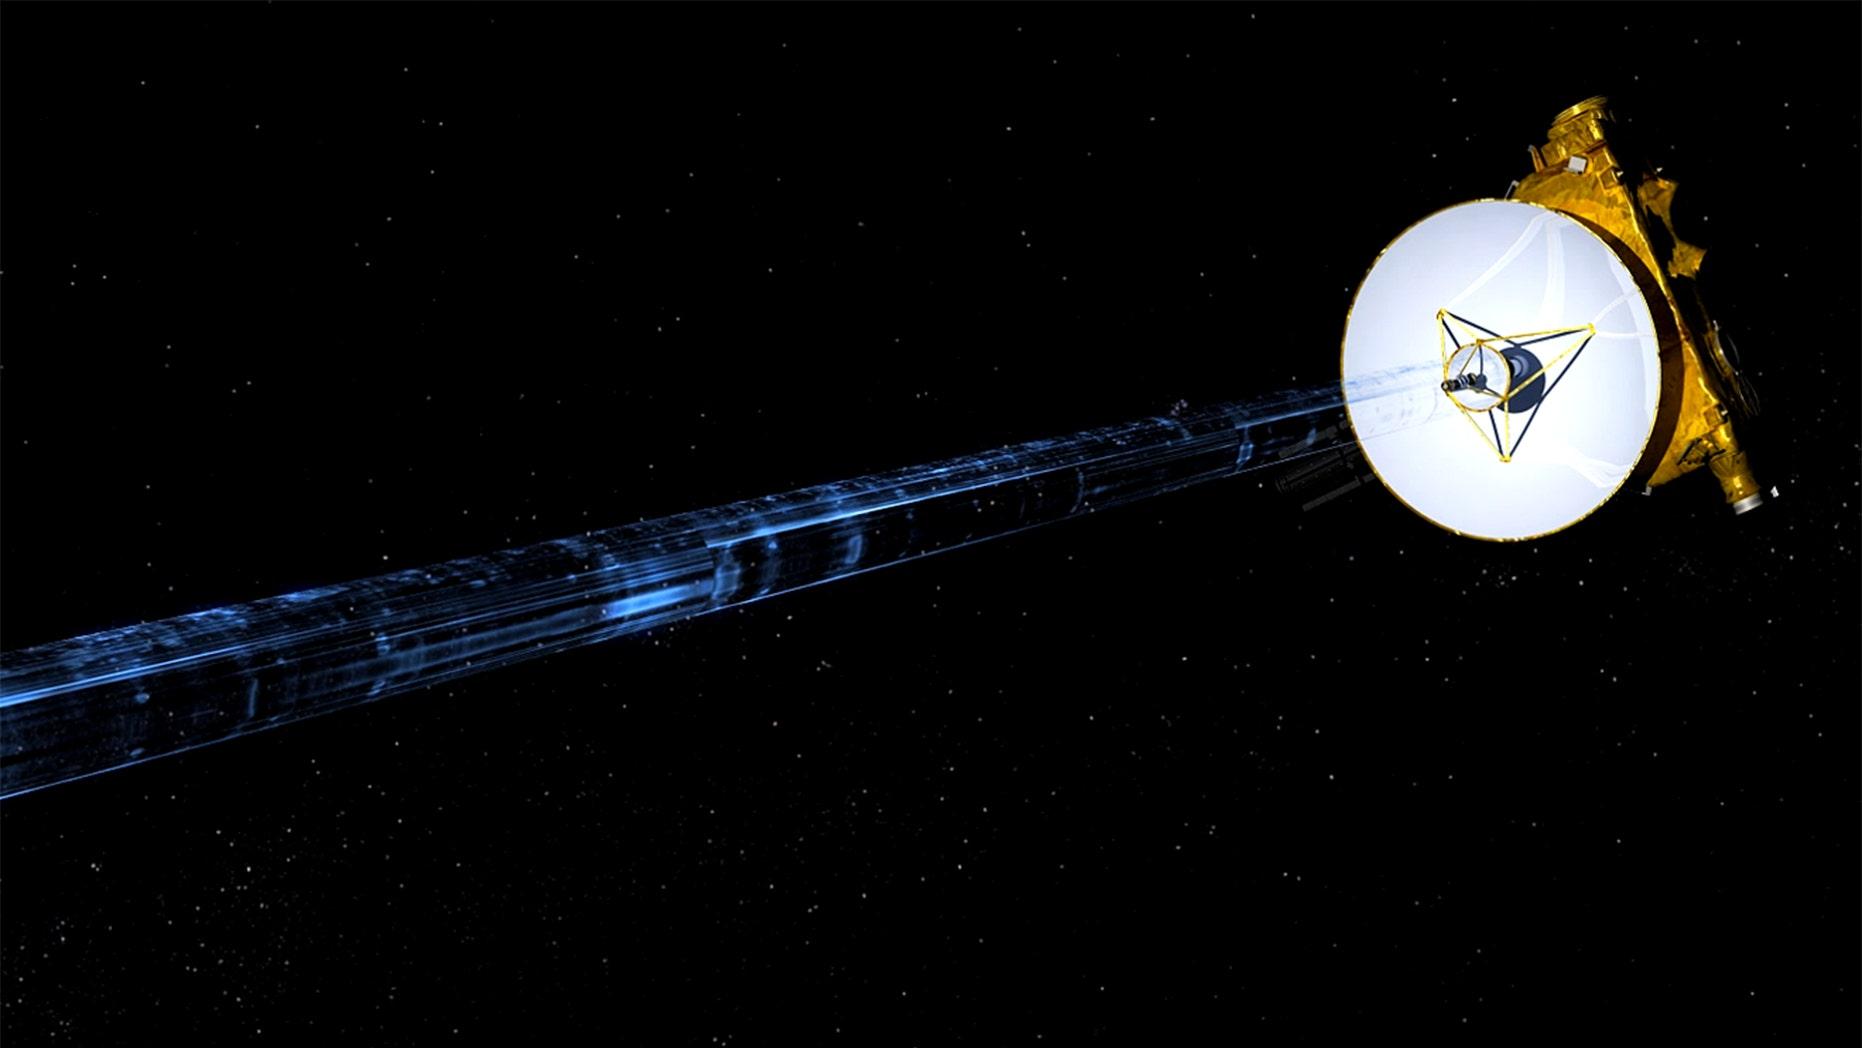 Artist's illustration of NASA's New Horizons spacecraft transmitting data back to Earth. (NASA/JHUAPL/SwRI)